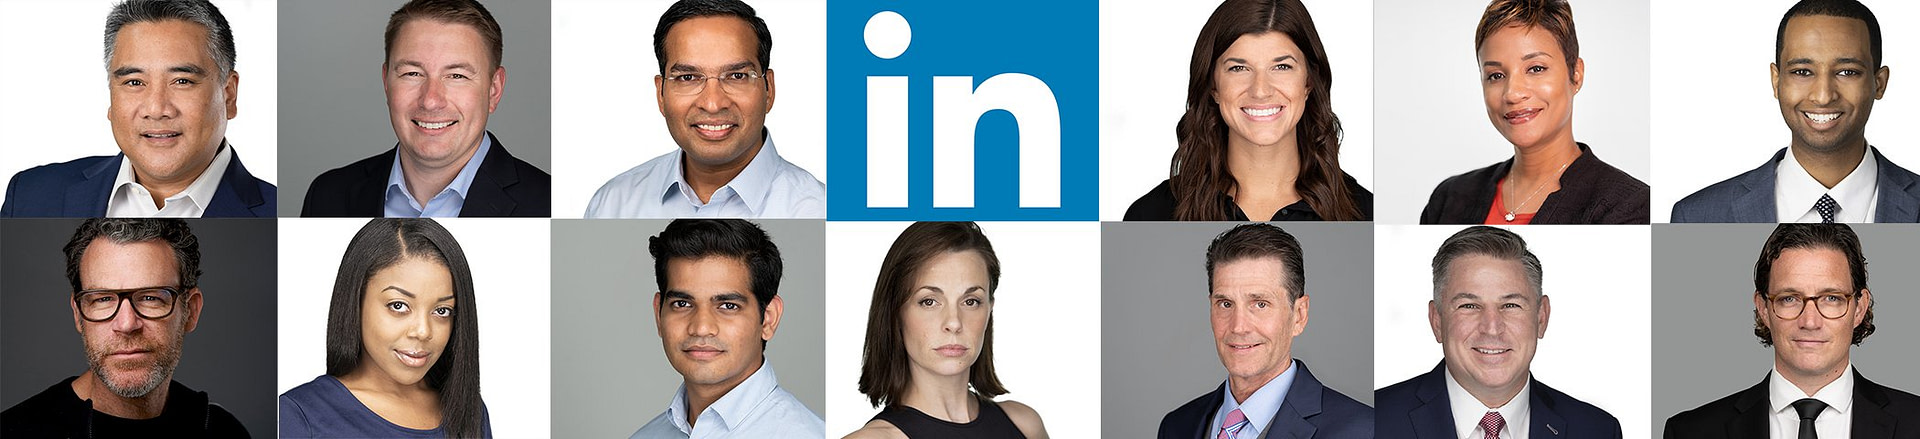 Professional Headshots for Linkedin